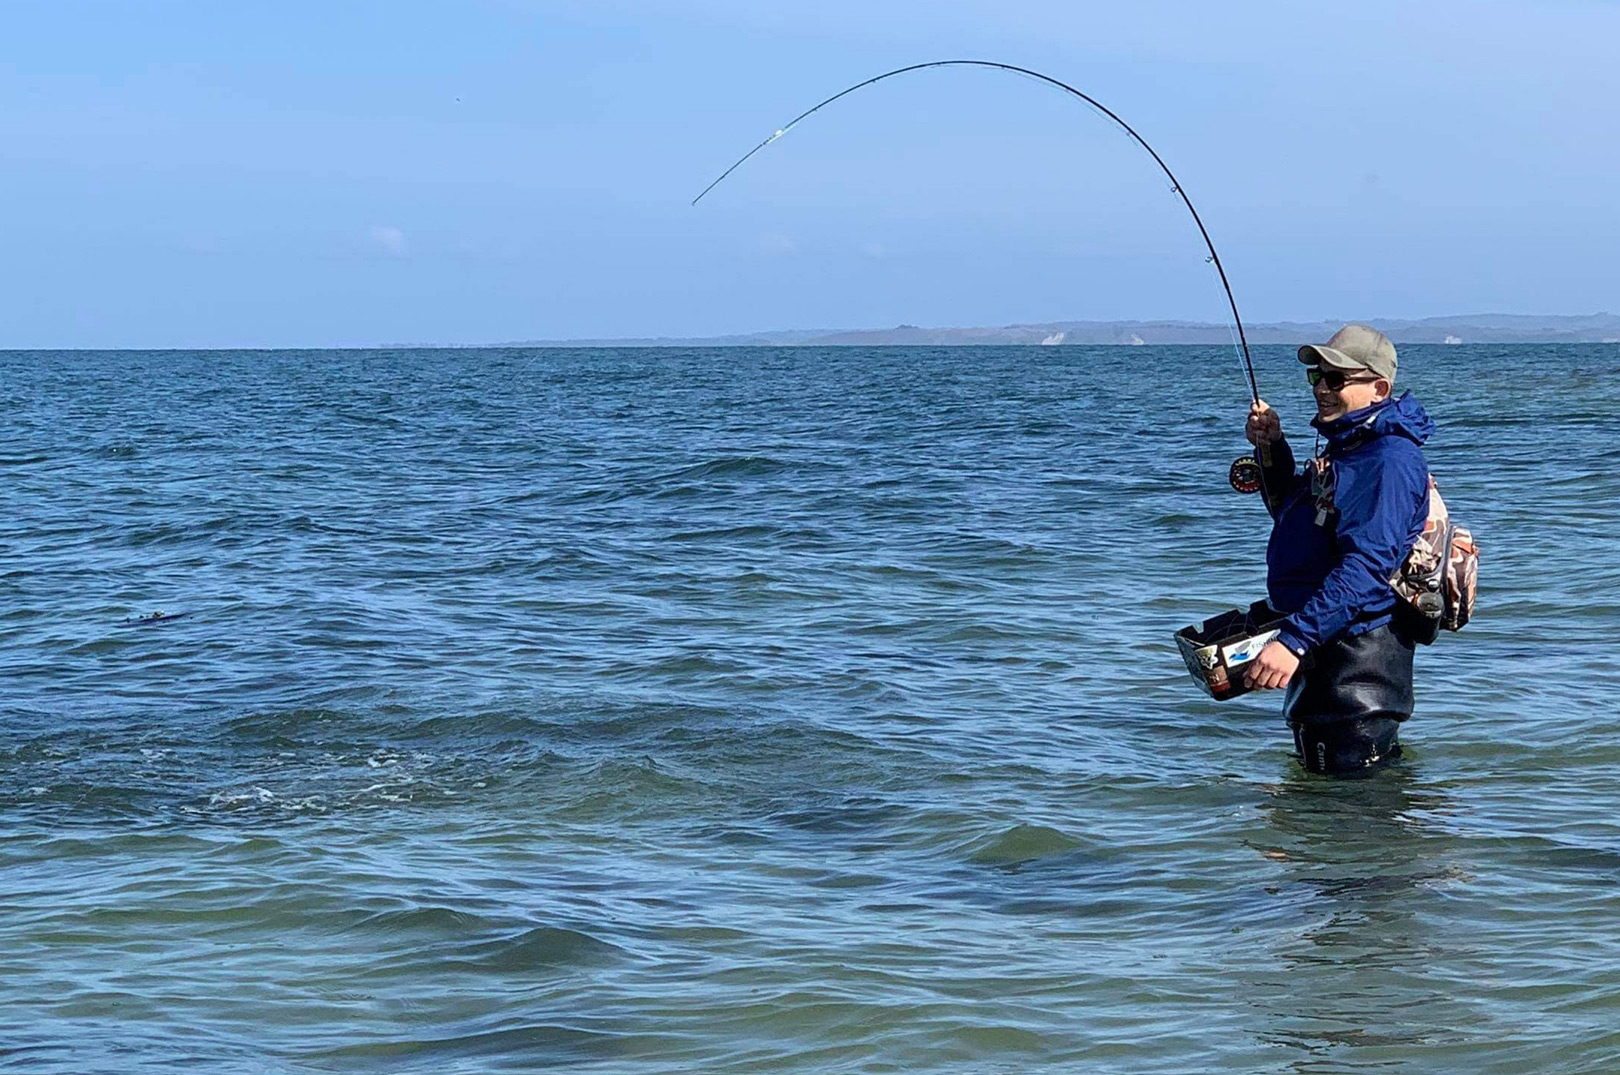 Maciek Popielski med fisk på